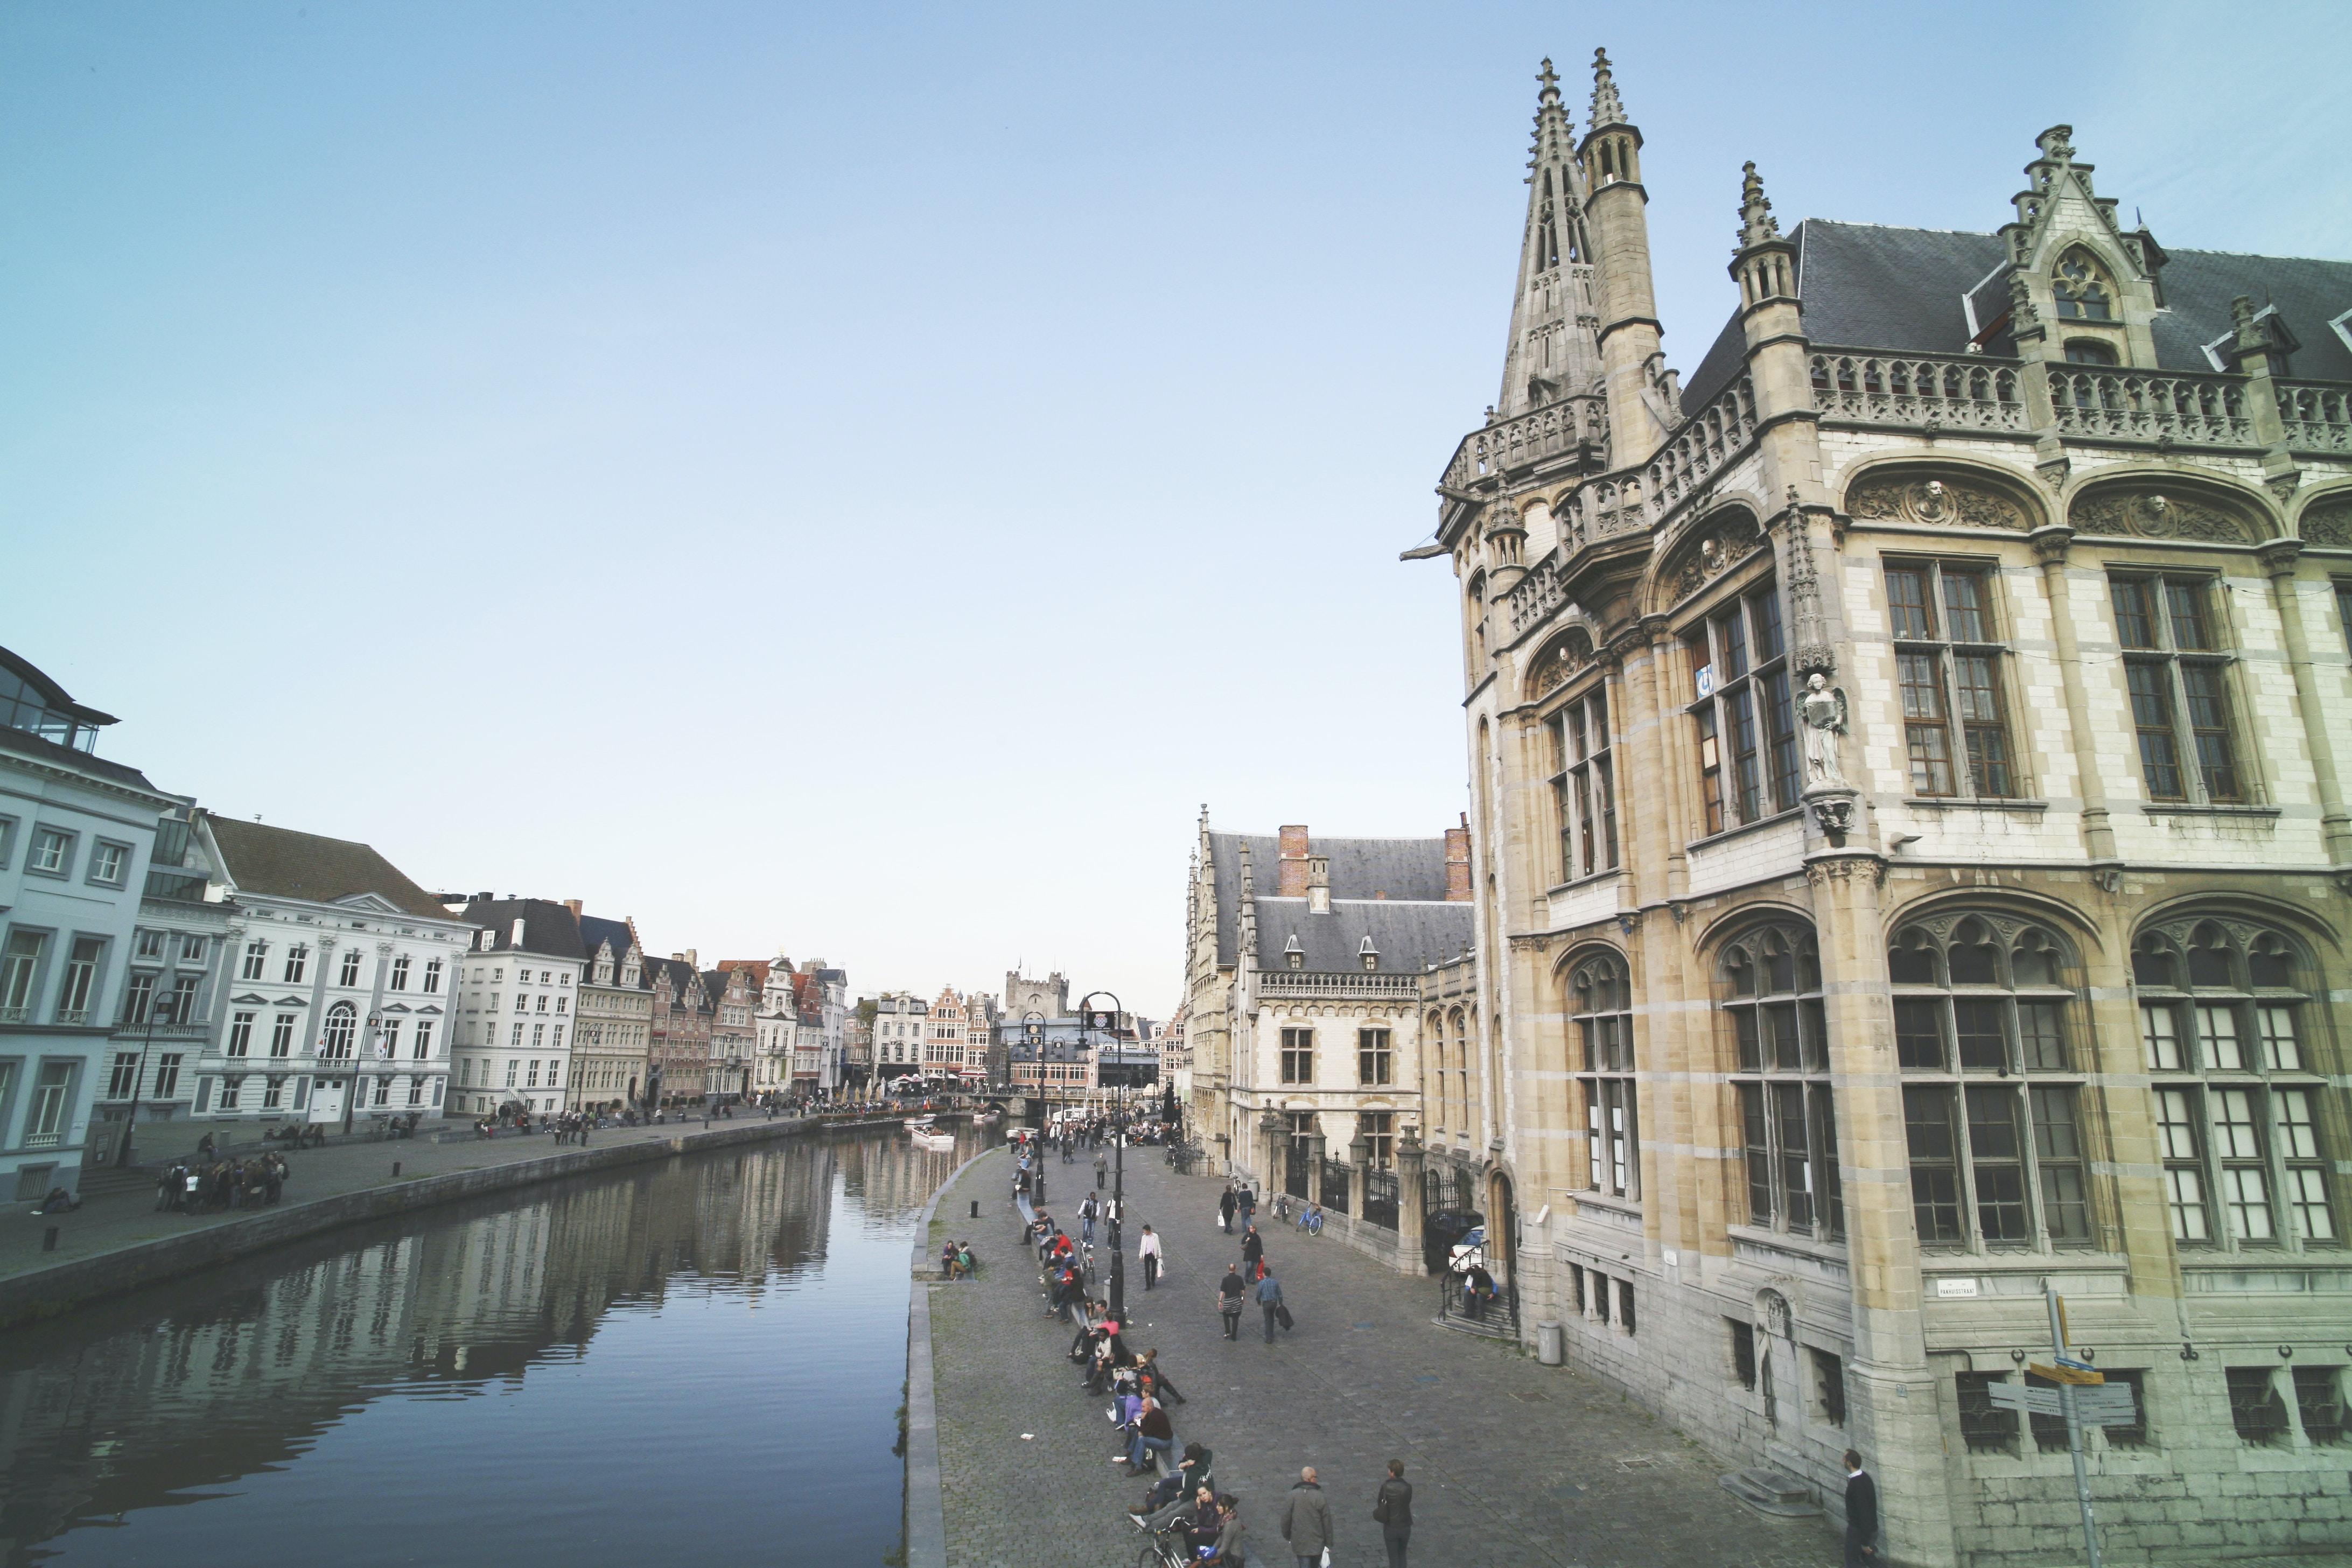 body of water between buildings